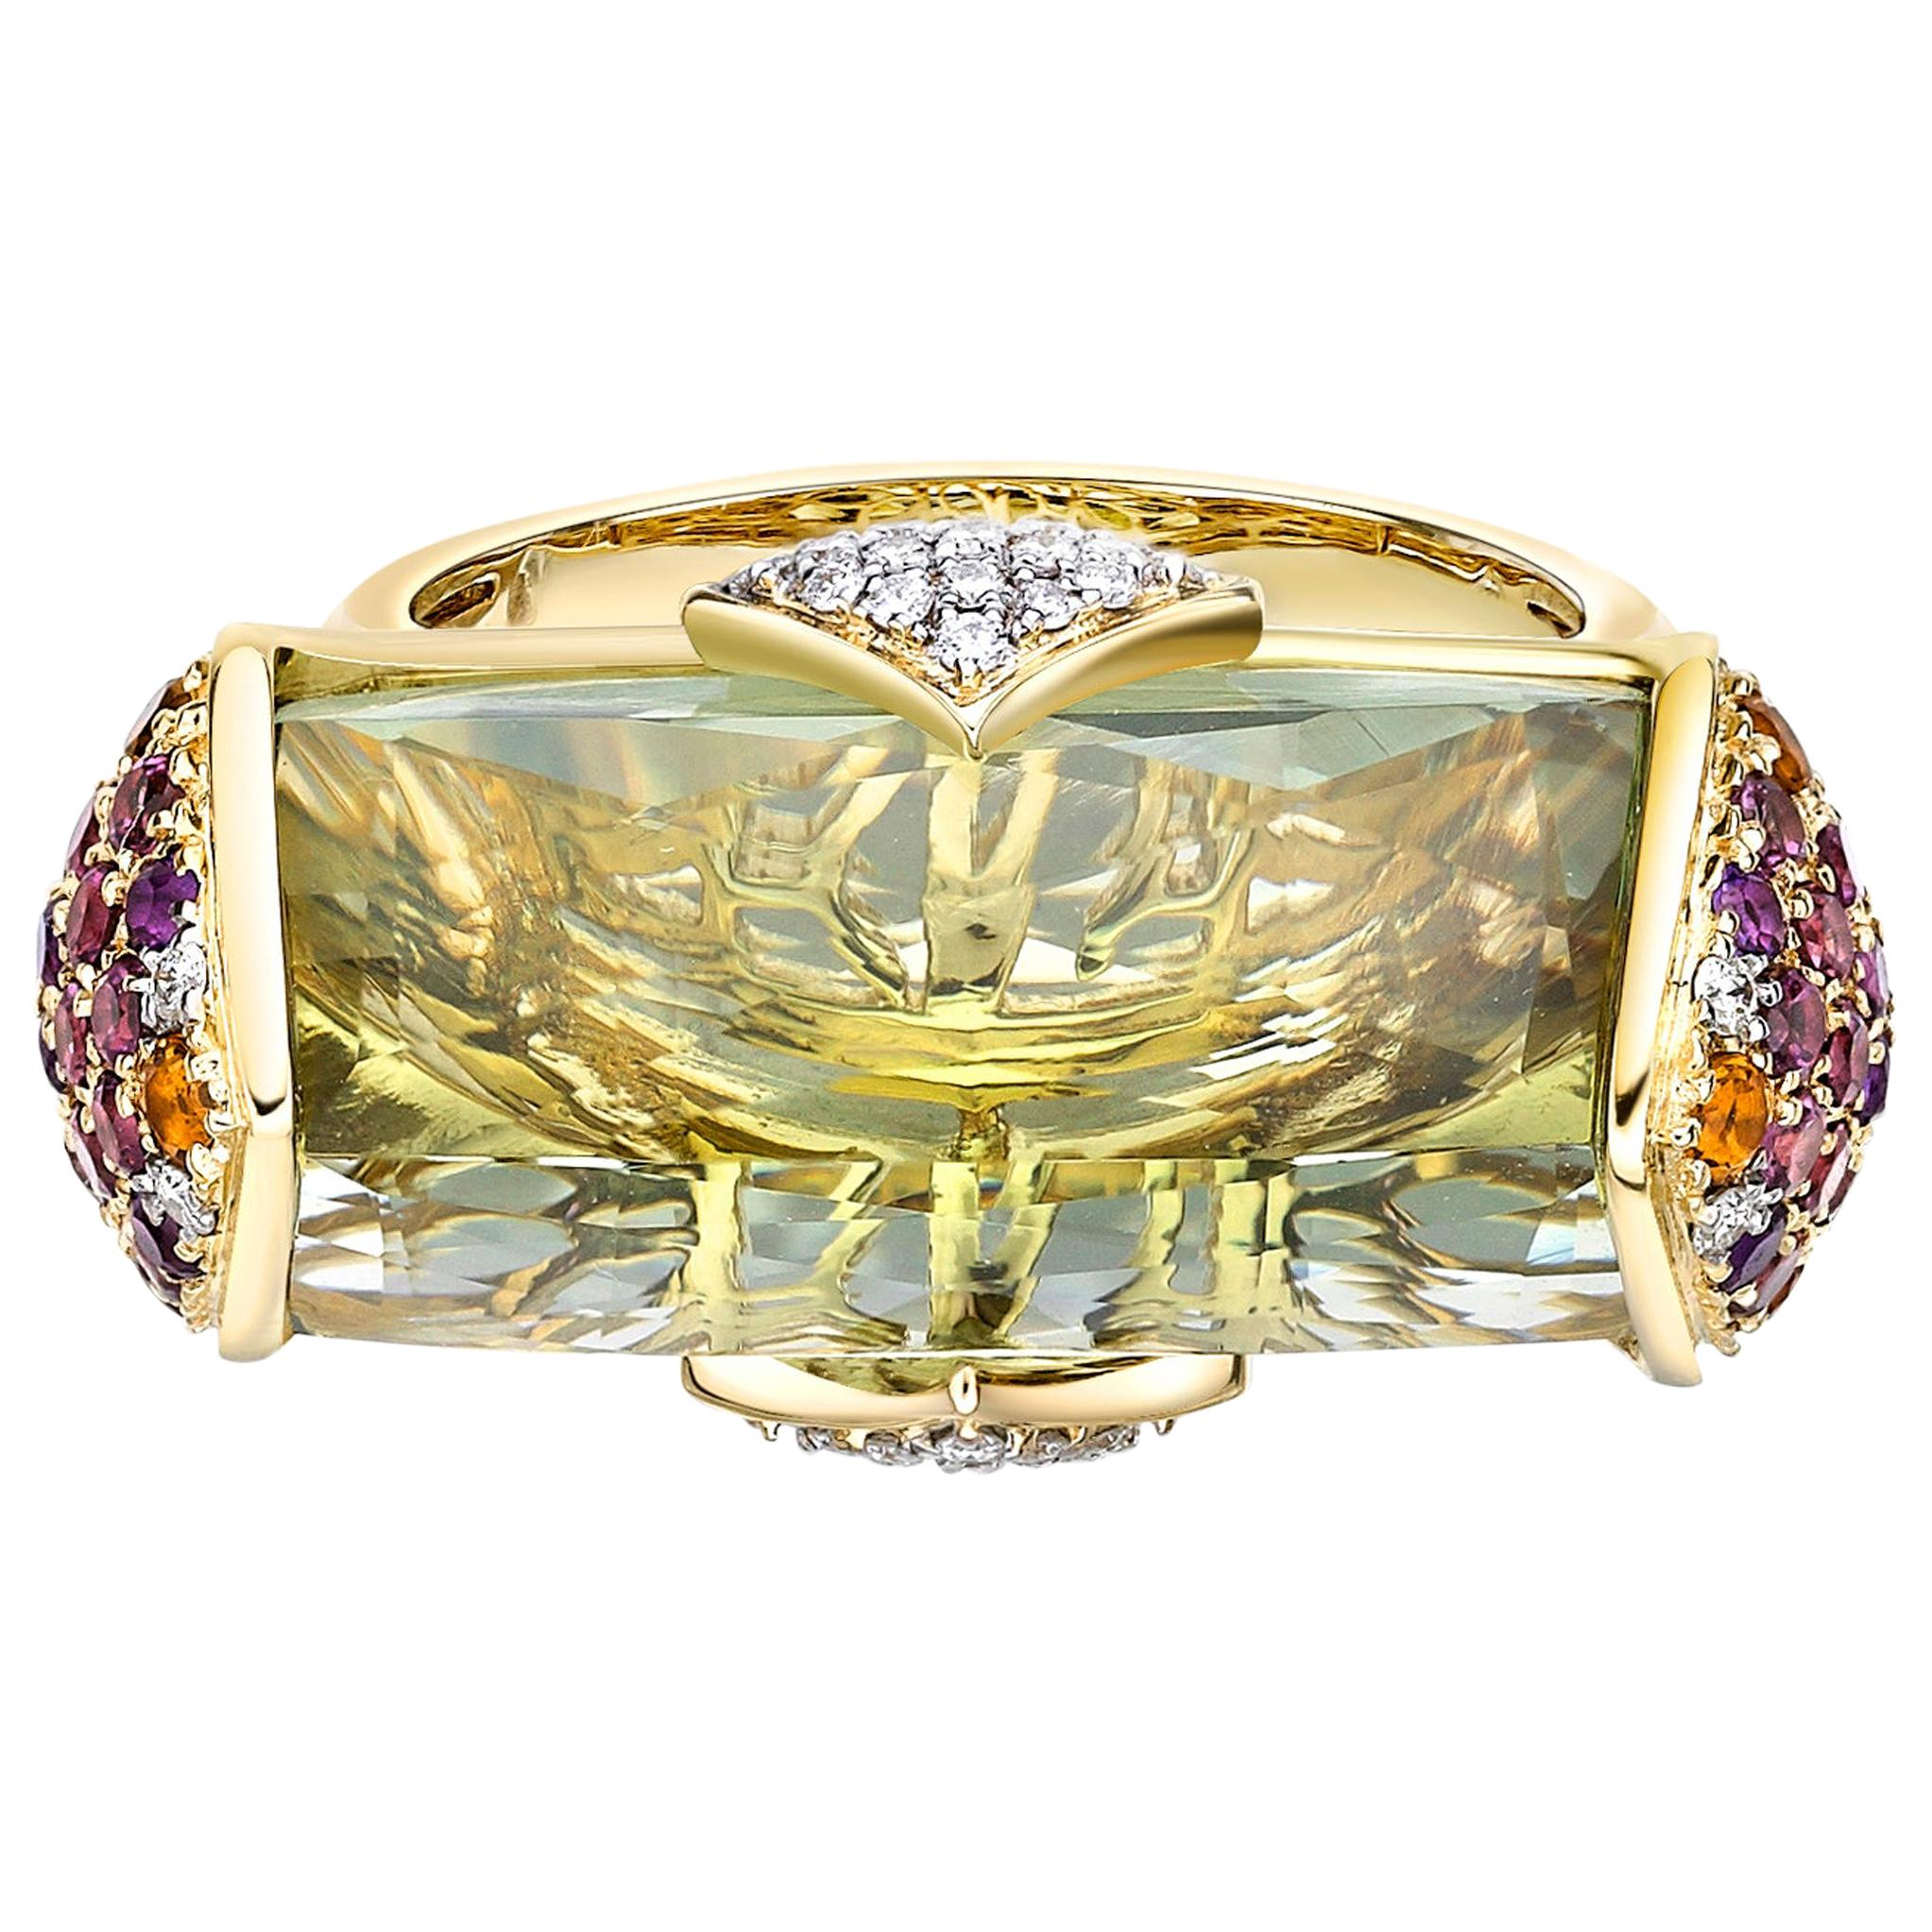 13.7 Carat Green Amethyst and Diamond Ring in 18 Karat Yellow Gold